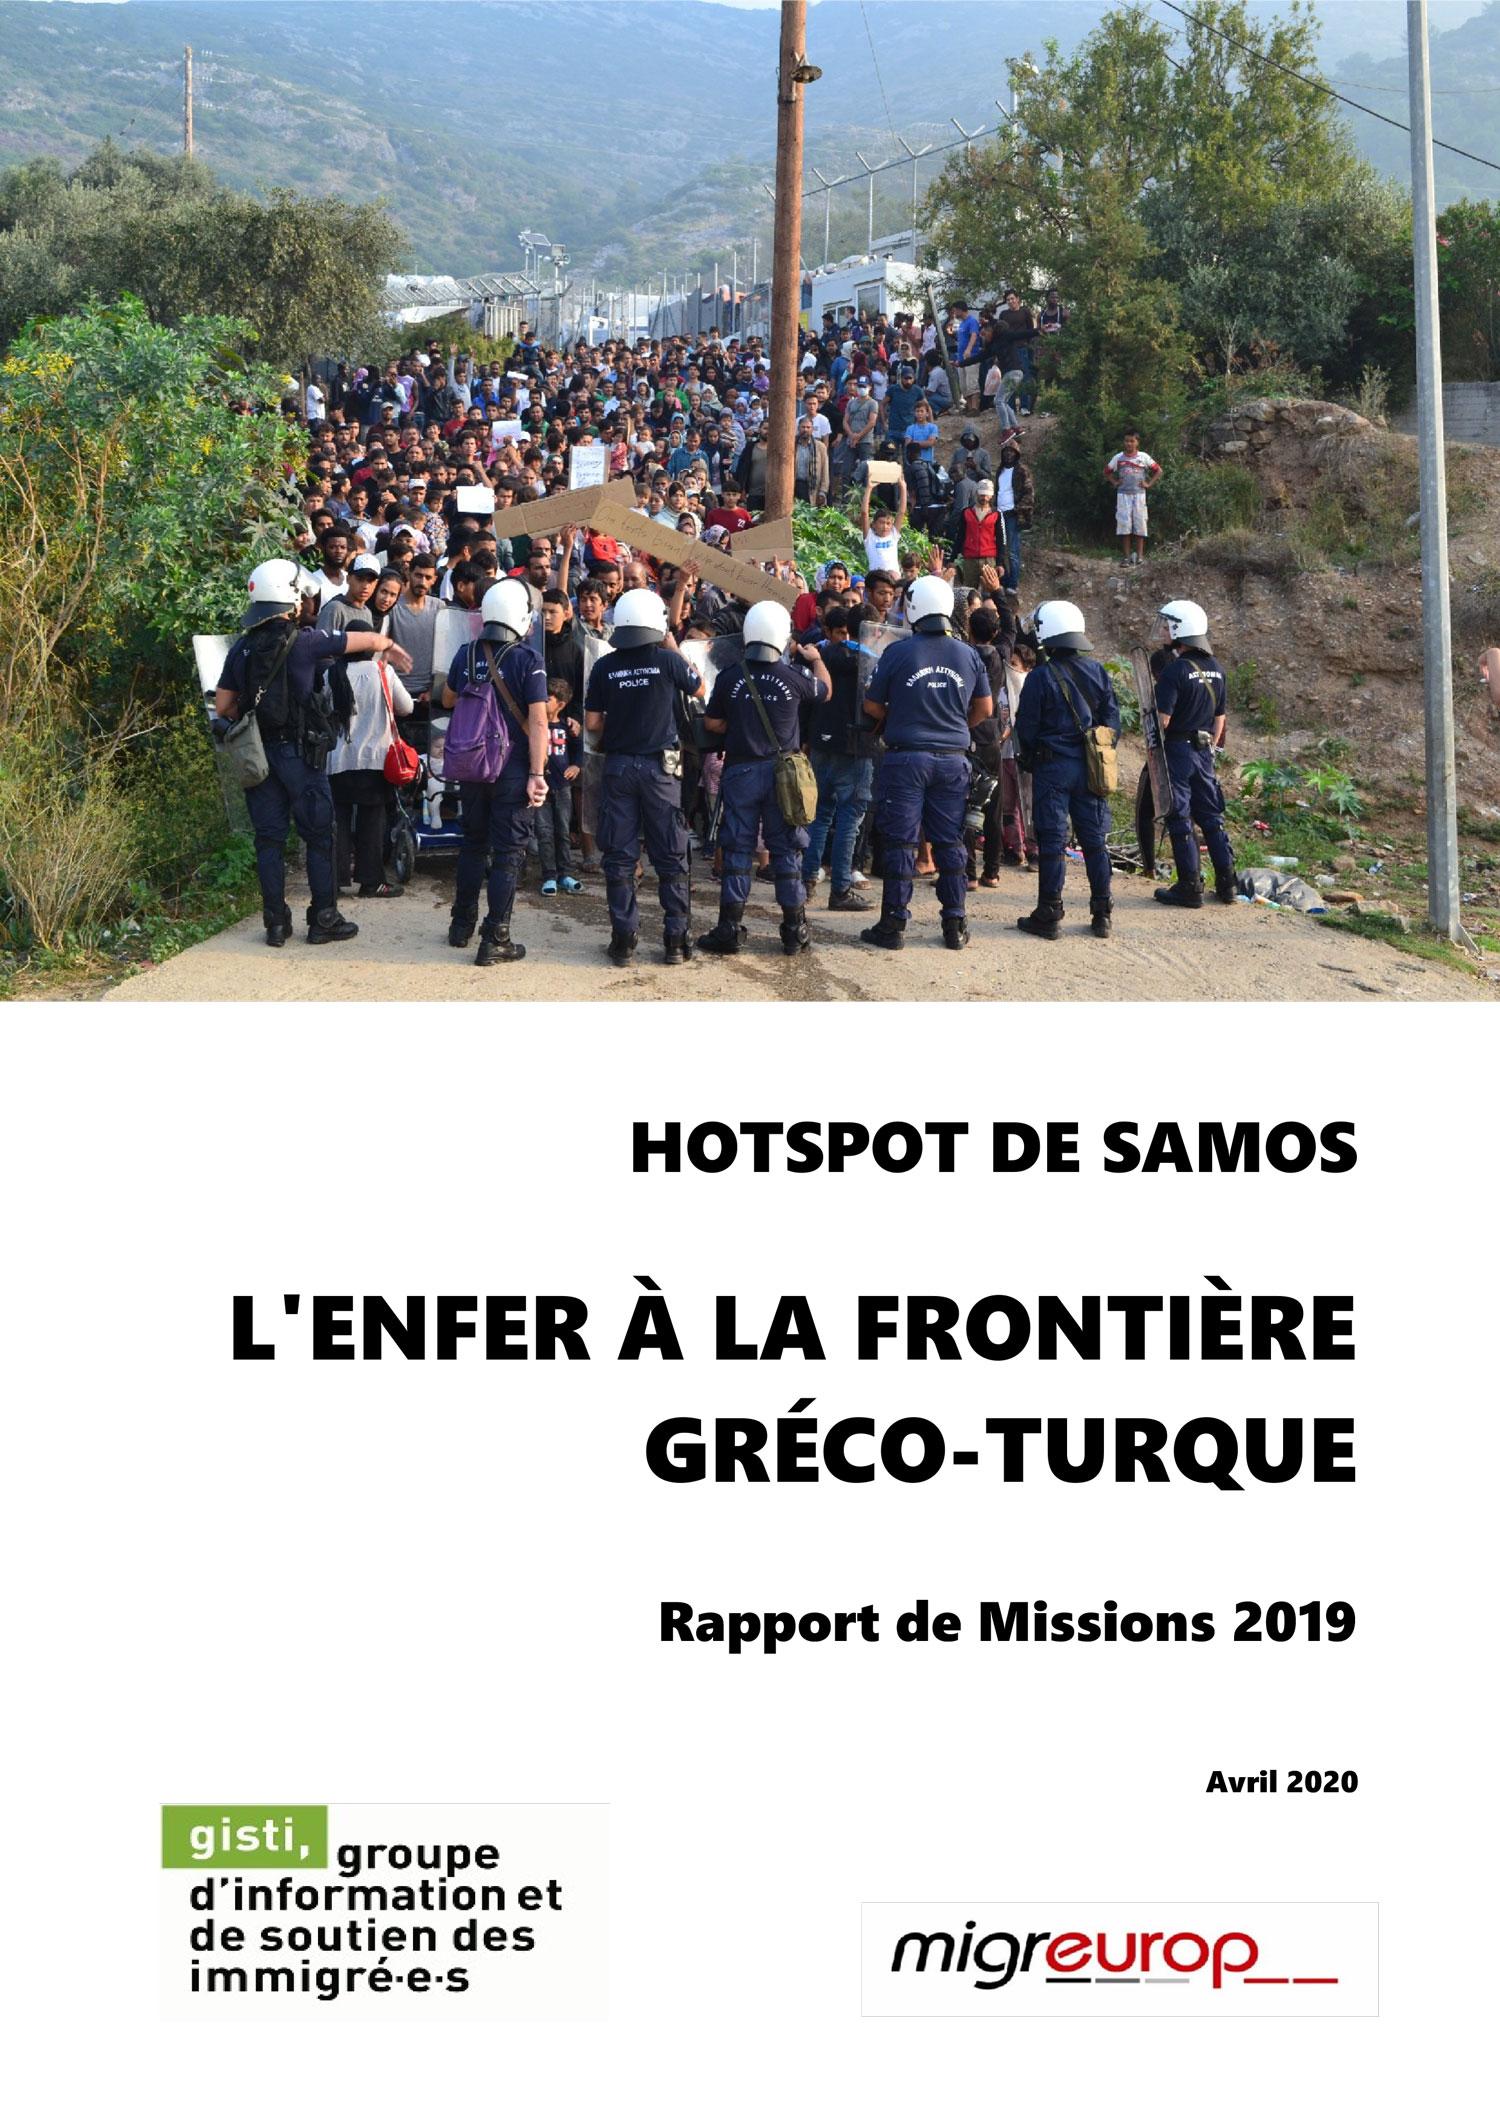 Refugee Rights Europe Pushbacks Greece-Turkey Border Hotspot De Samos